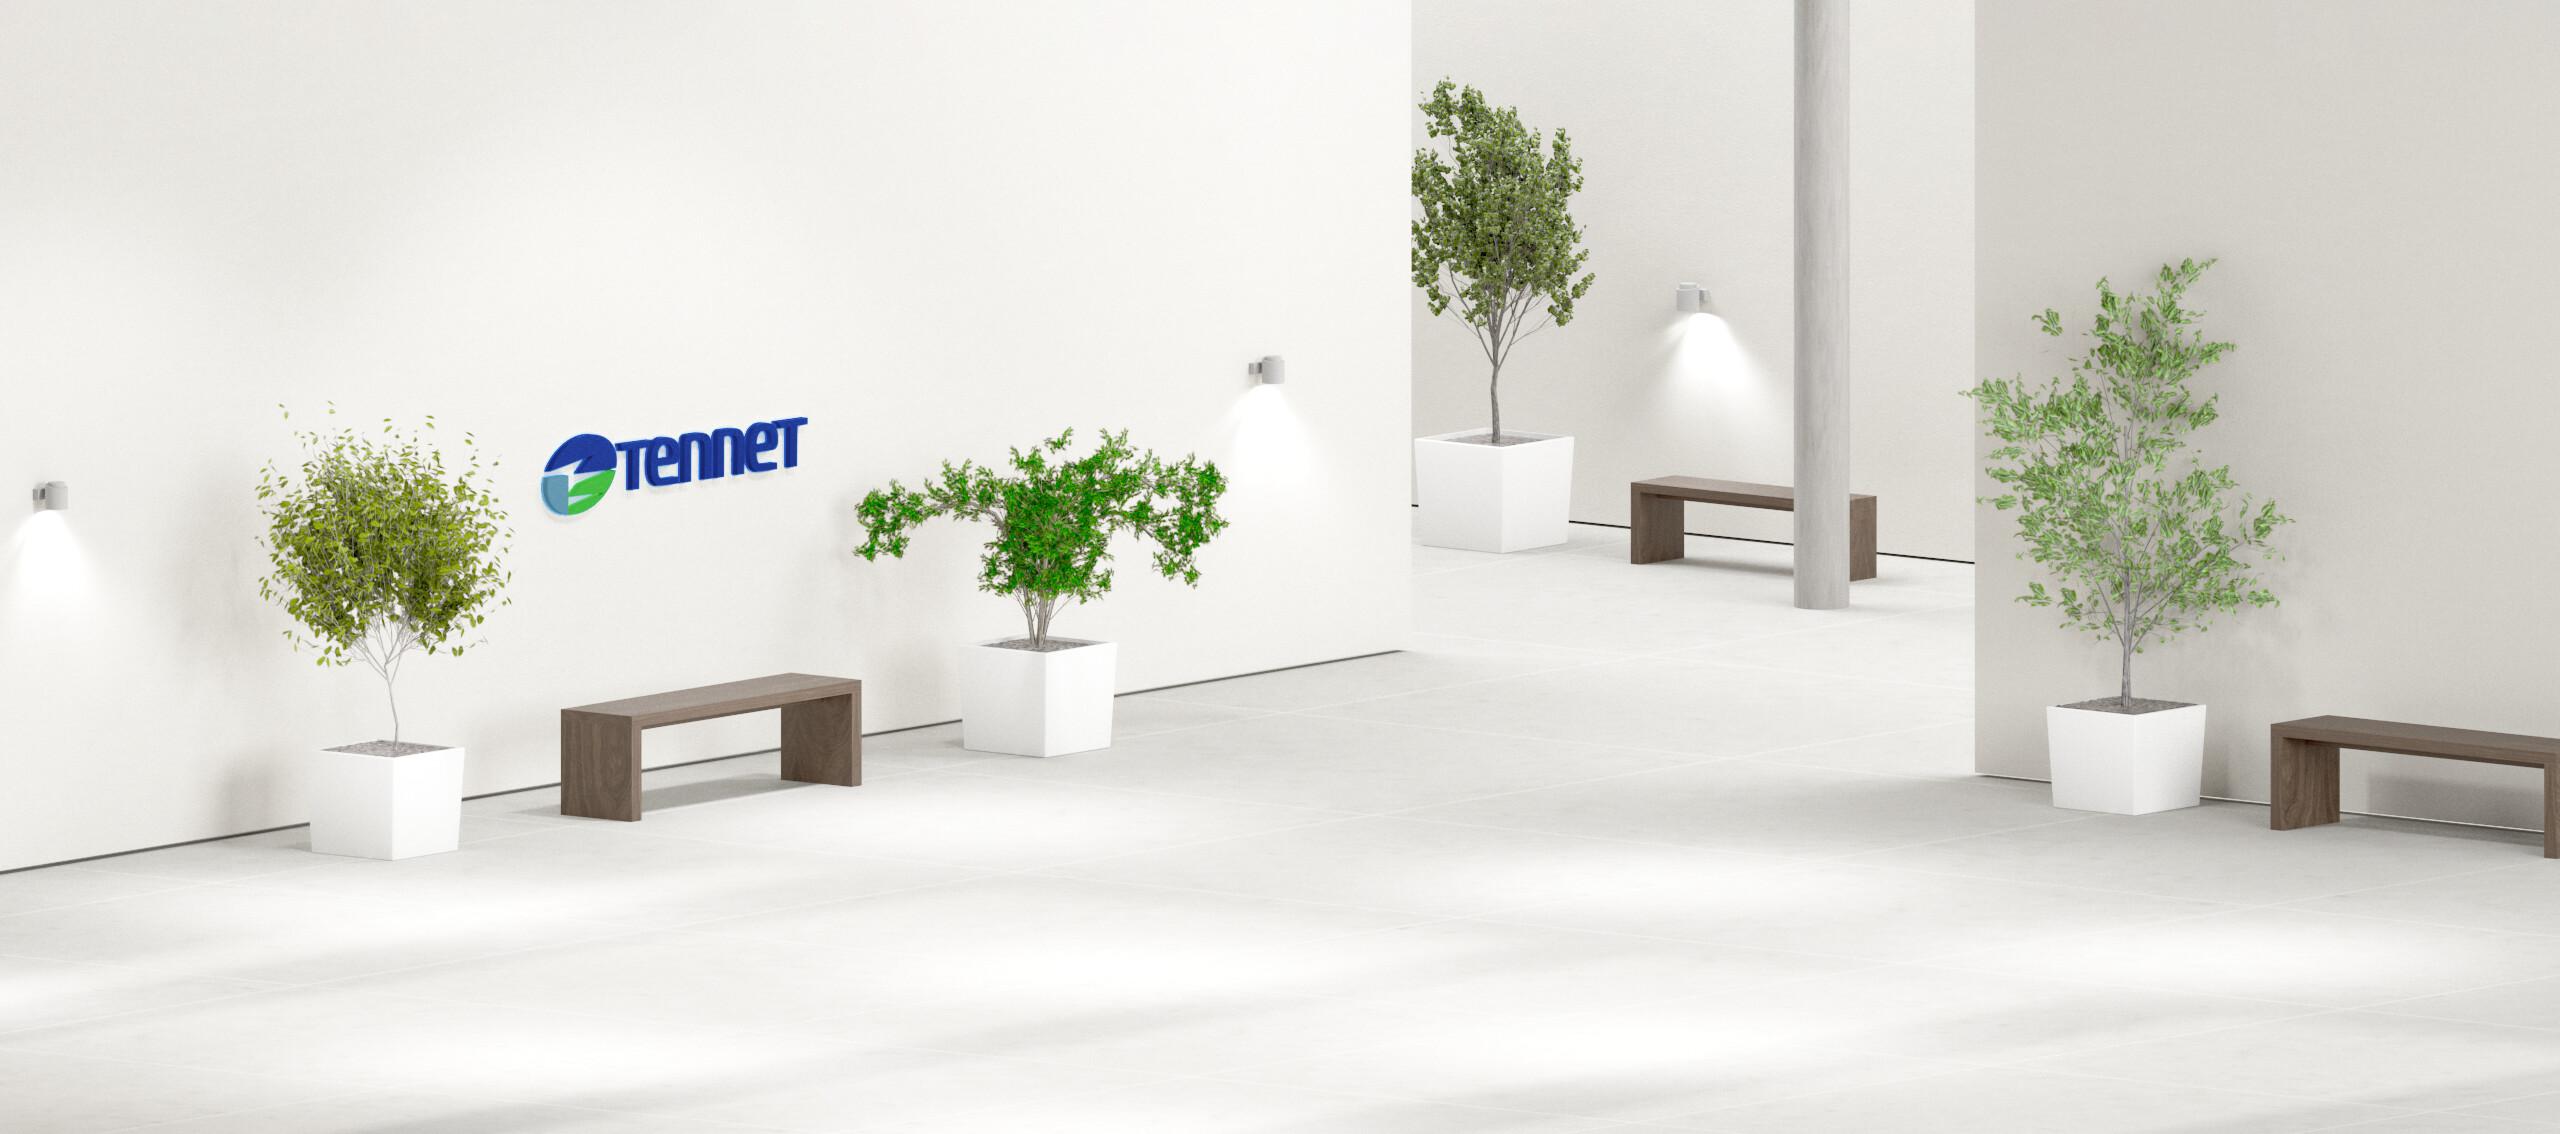 Interaktiver 3D Raum